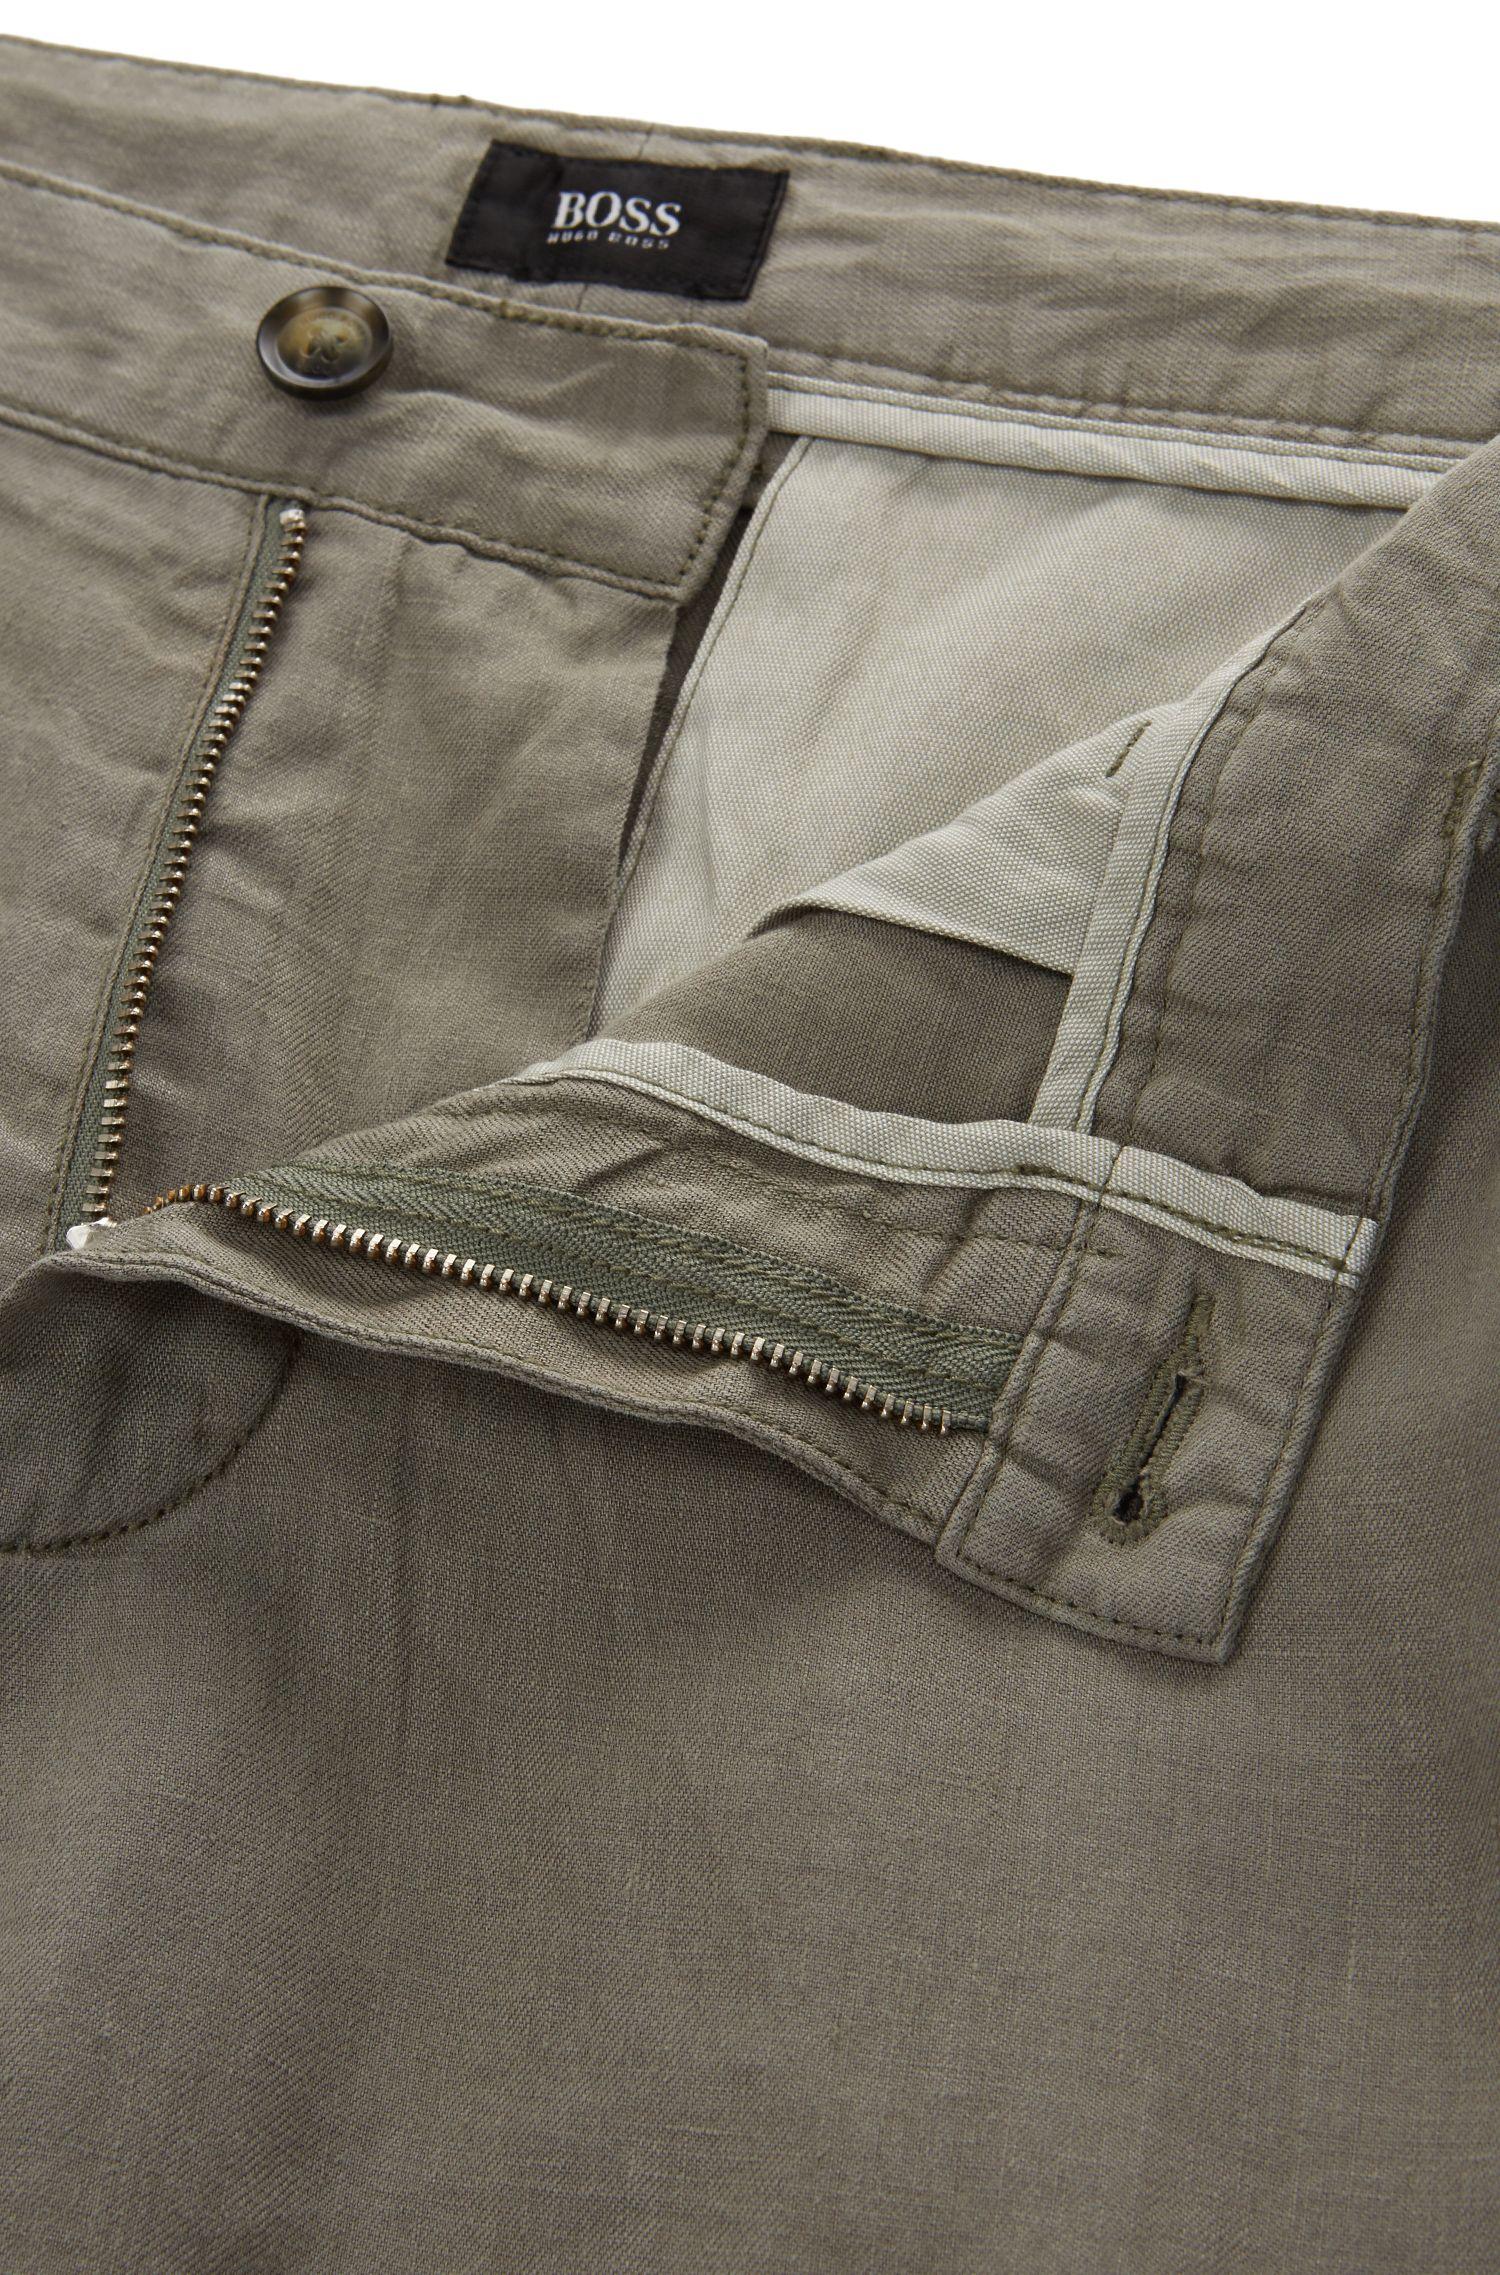 Regular Fit, Linen Short, Regular Fit | Crigan Short D